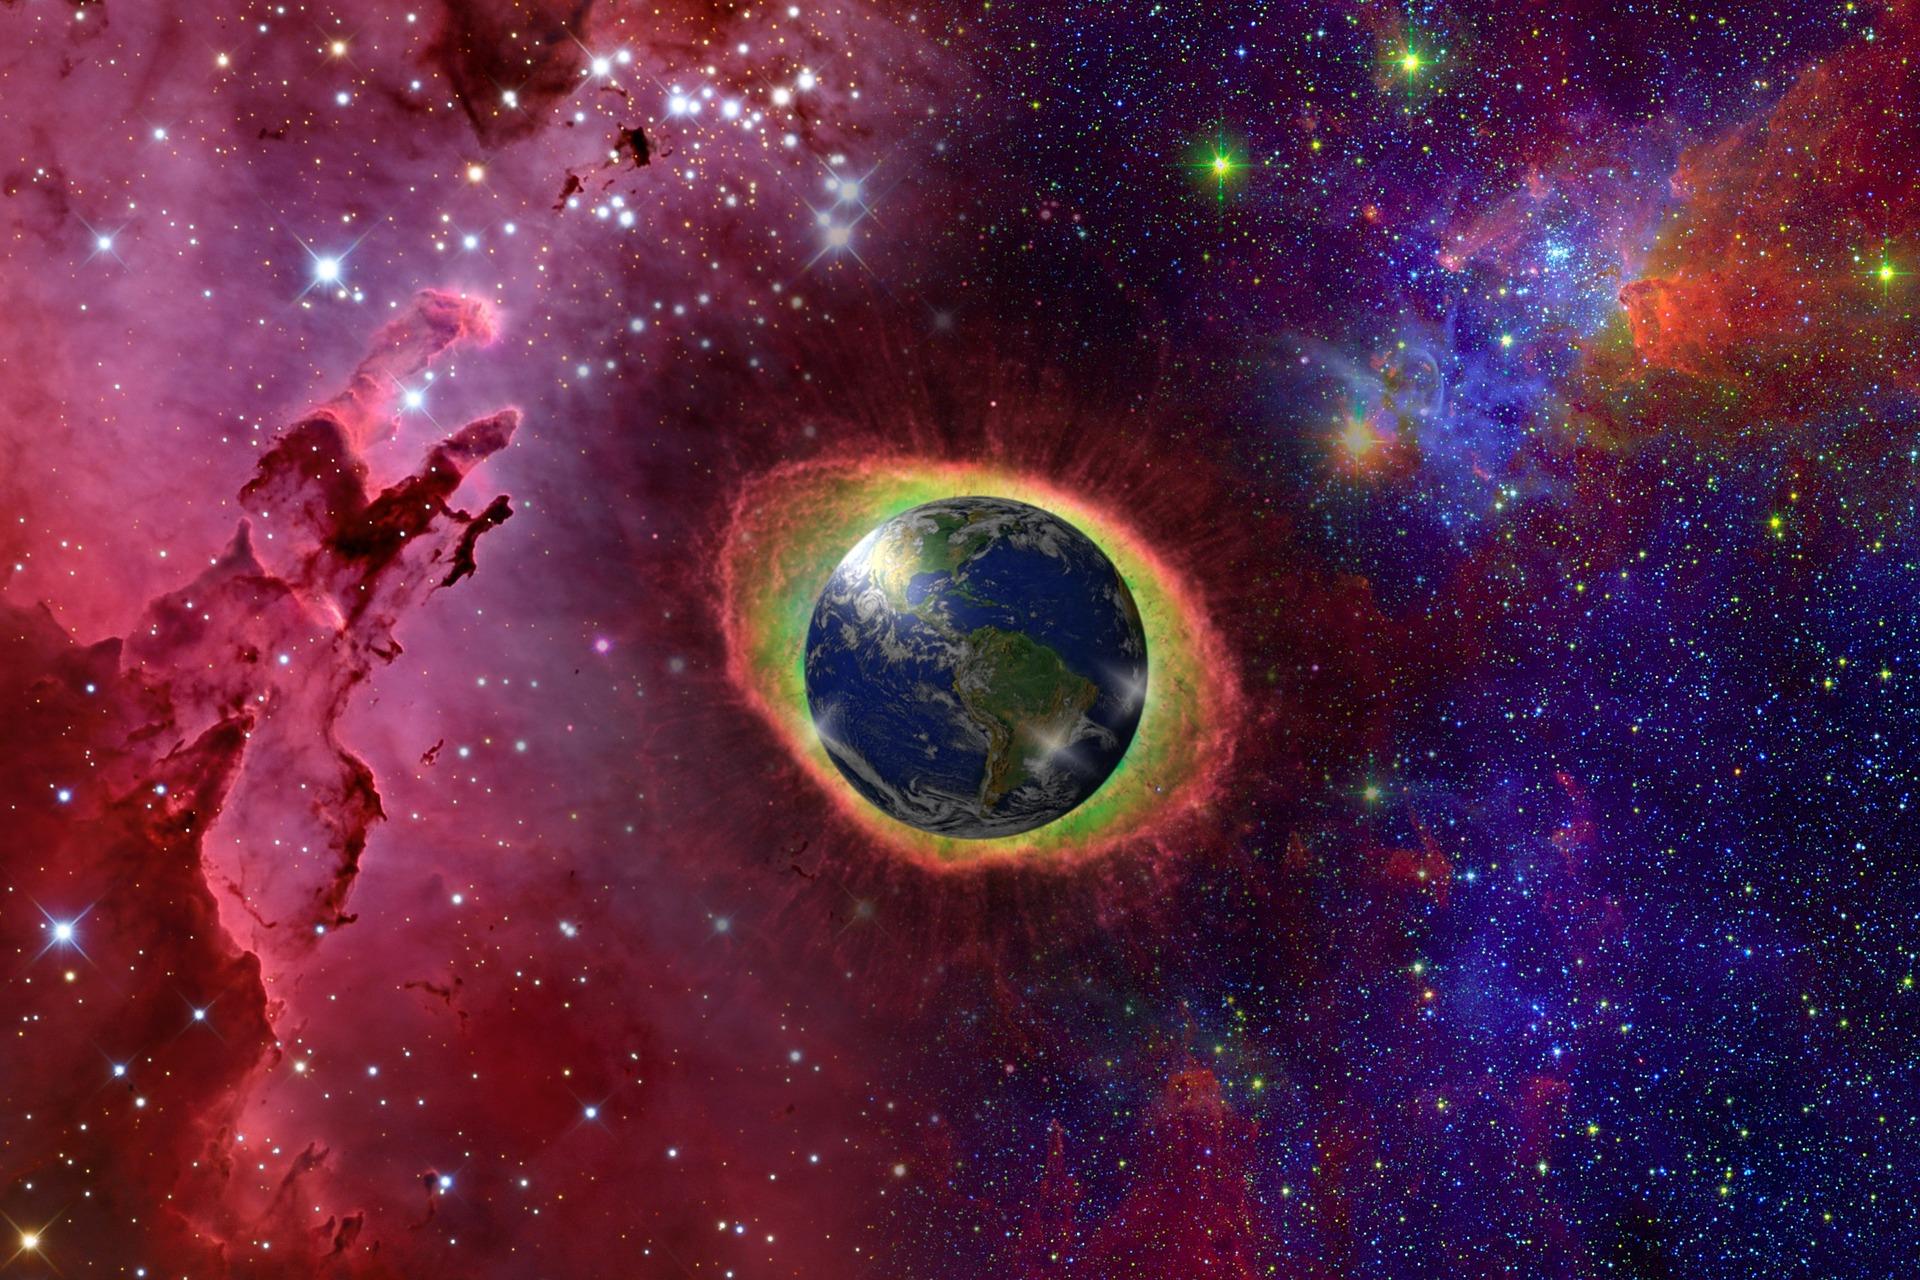 universe-2266887_1920.jpg